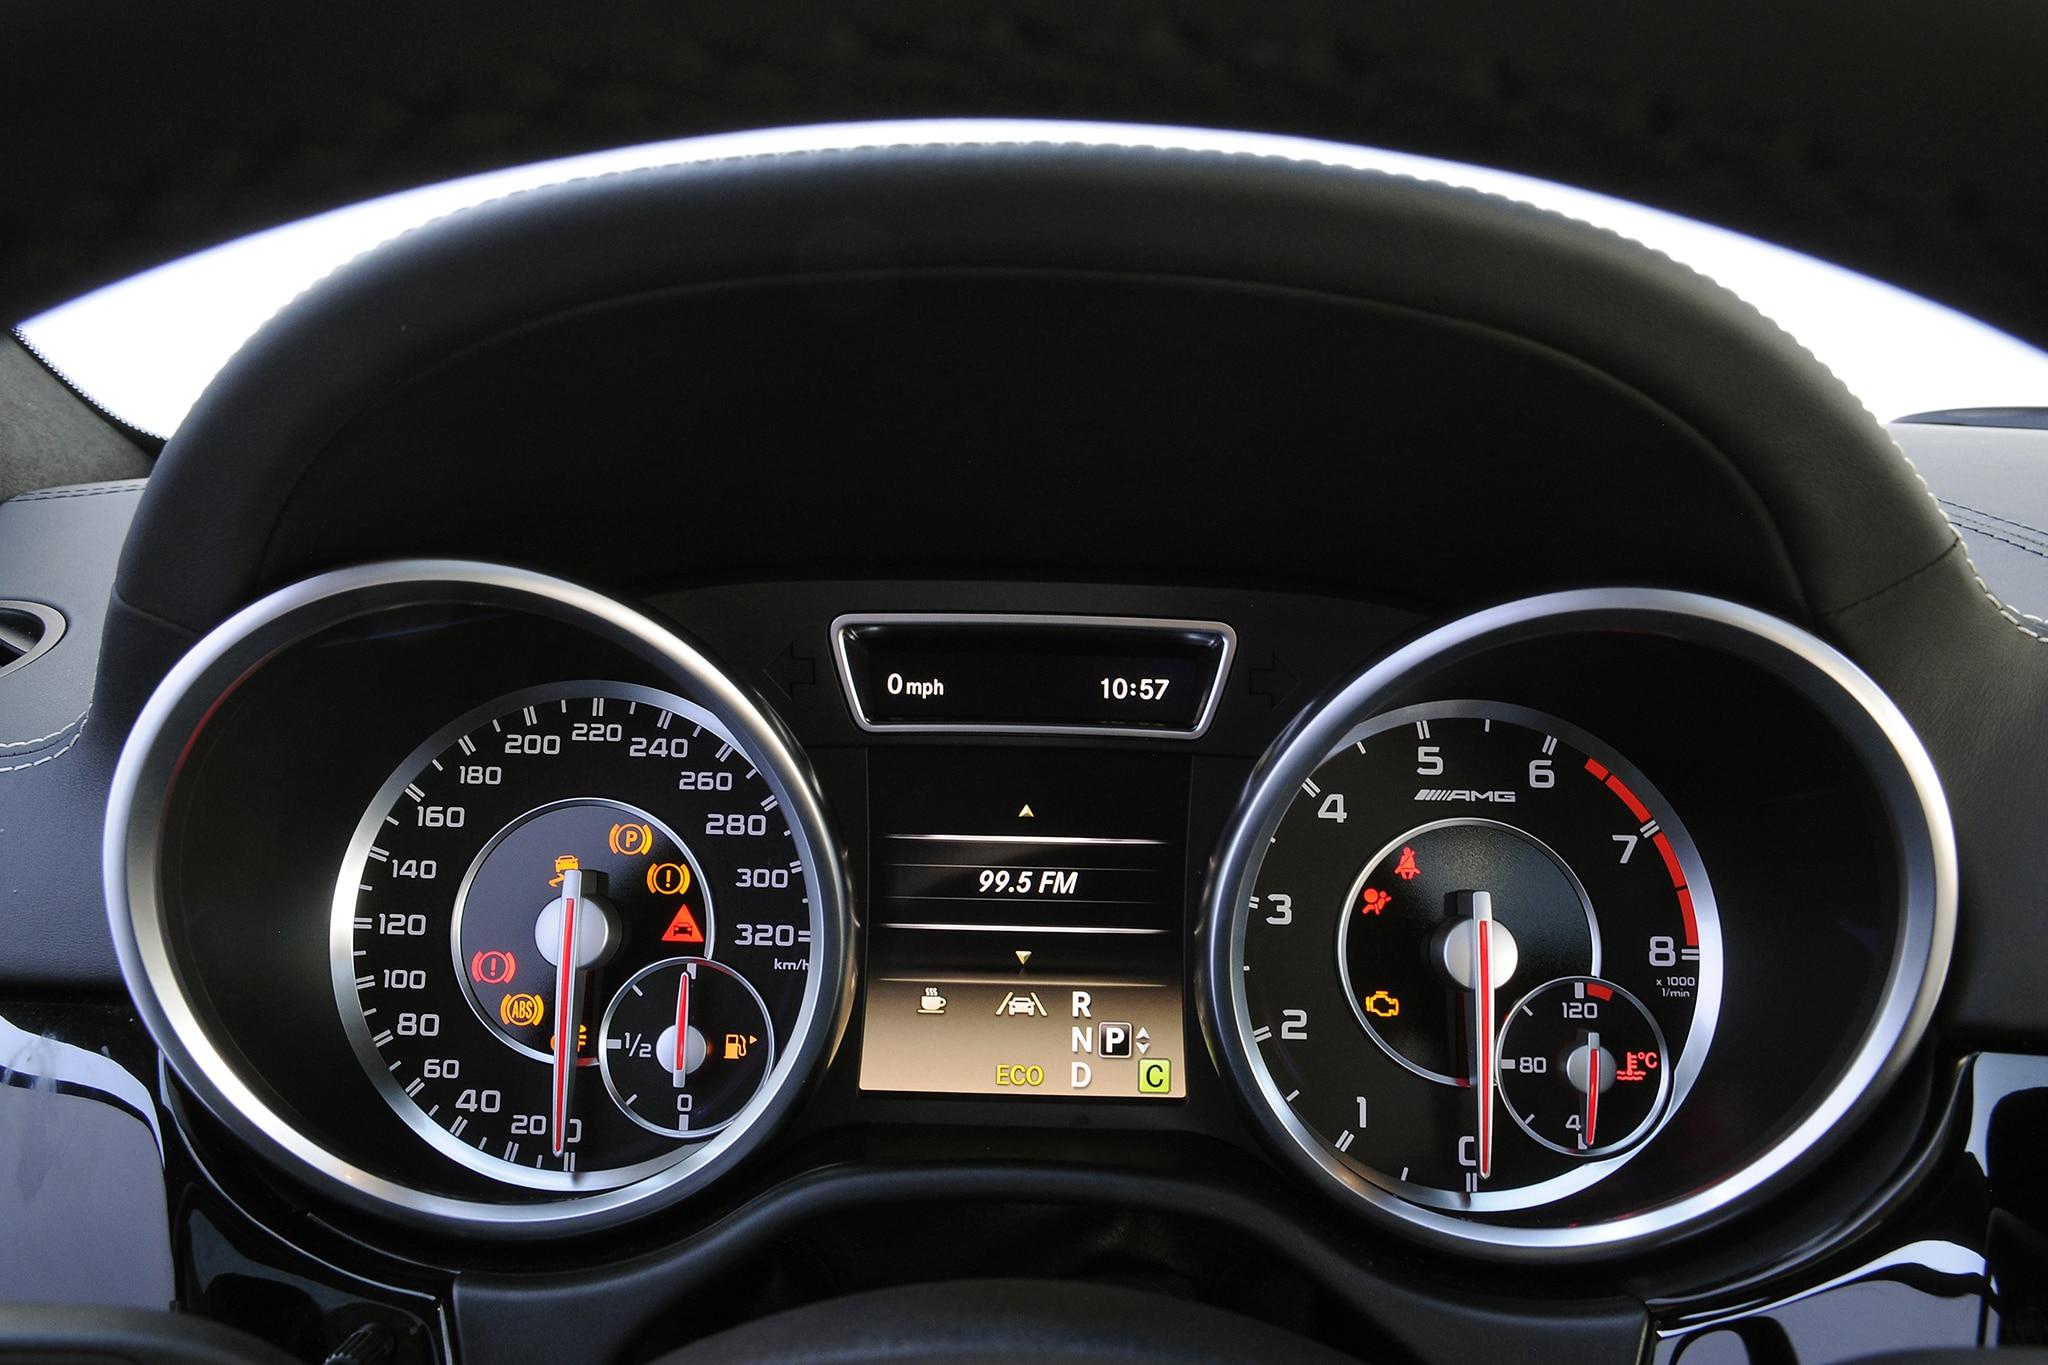 Brabus mercedes ml63 gl63 amg get 186 mph top speed